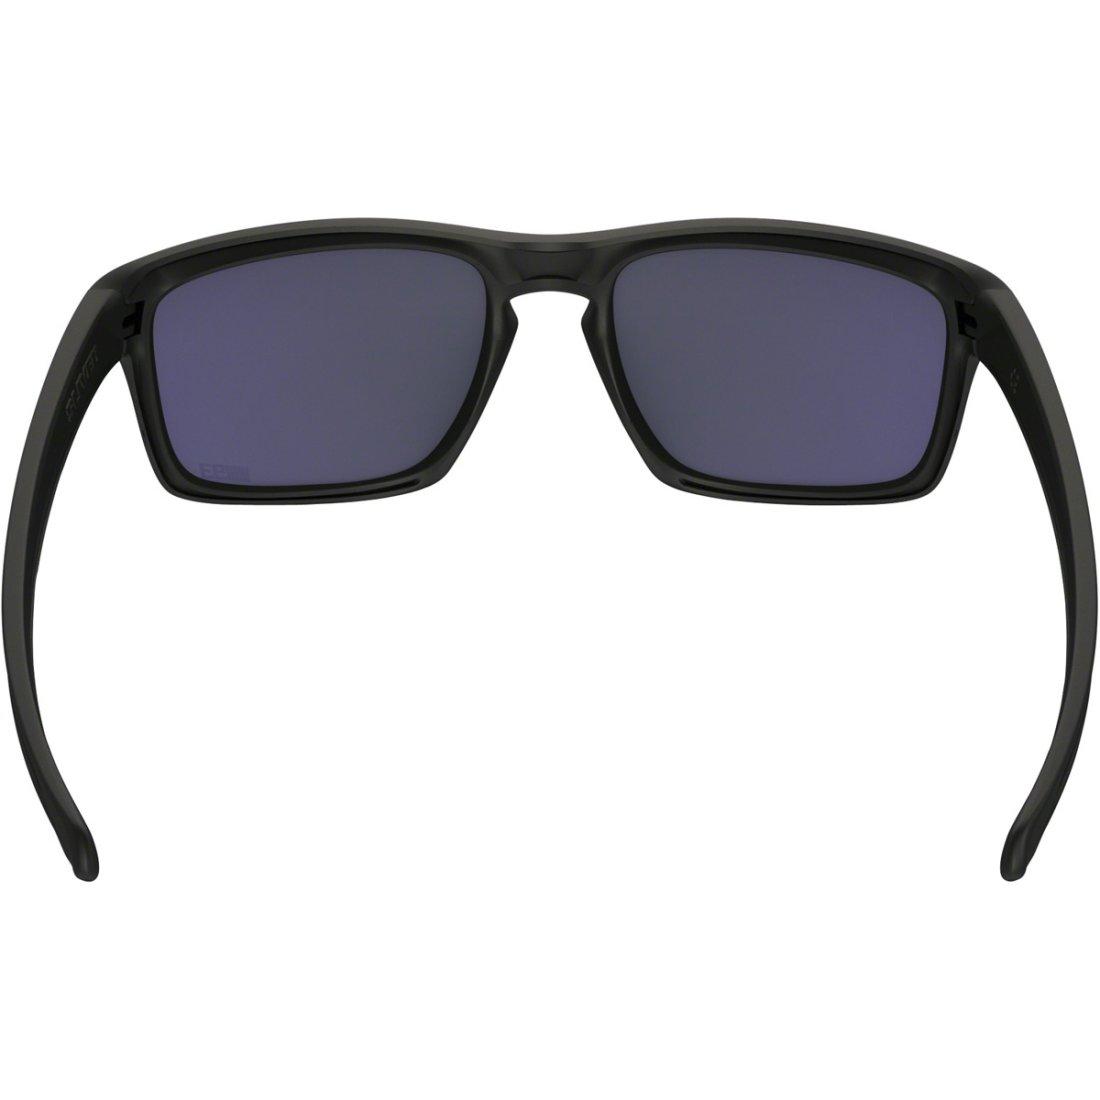 c04bfa2cc3 OAKLEY Sliver Marc Marquez Exclusive Edition Matte Black   Positive Red  Iridium Sun glasses